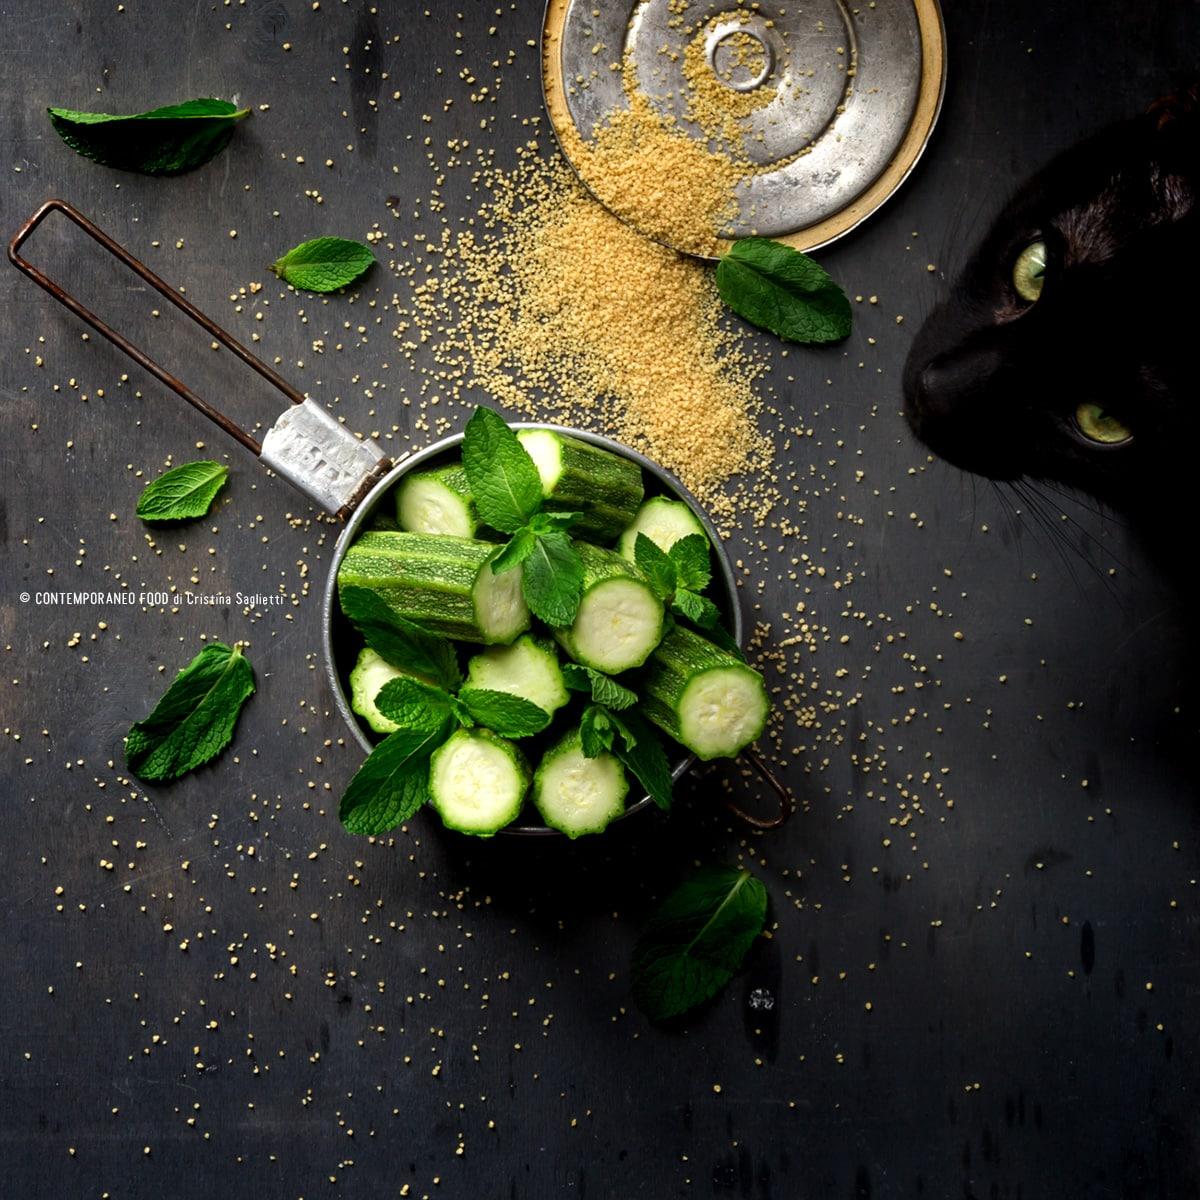 couscous-zucchine-saraguida-app-contemporaneo-food